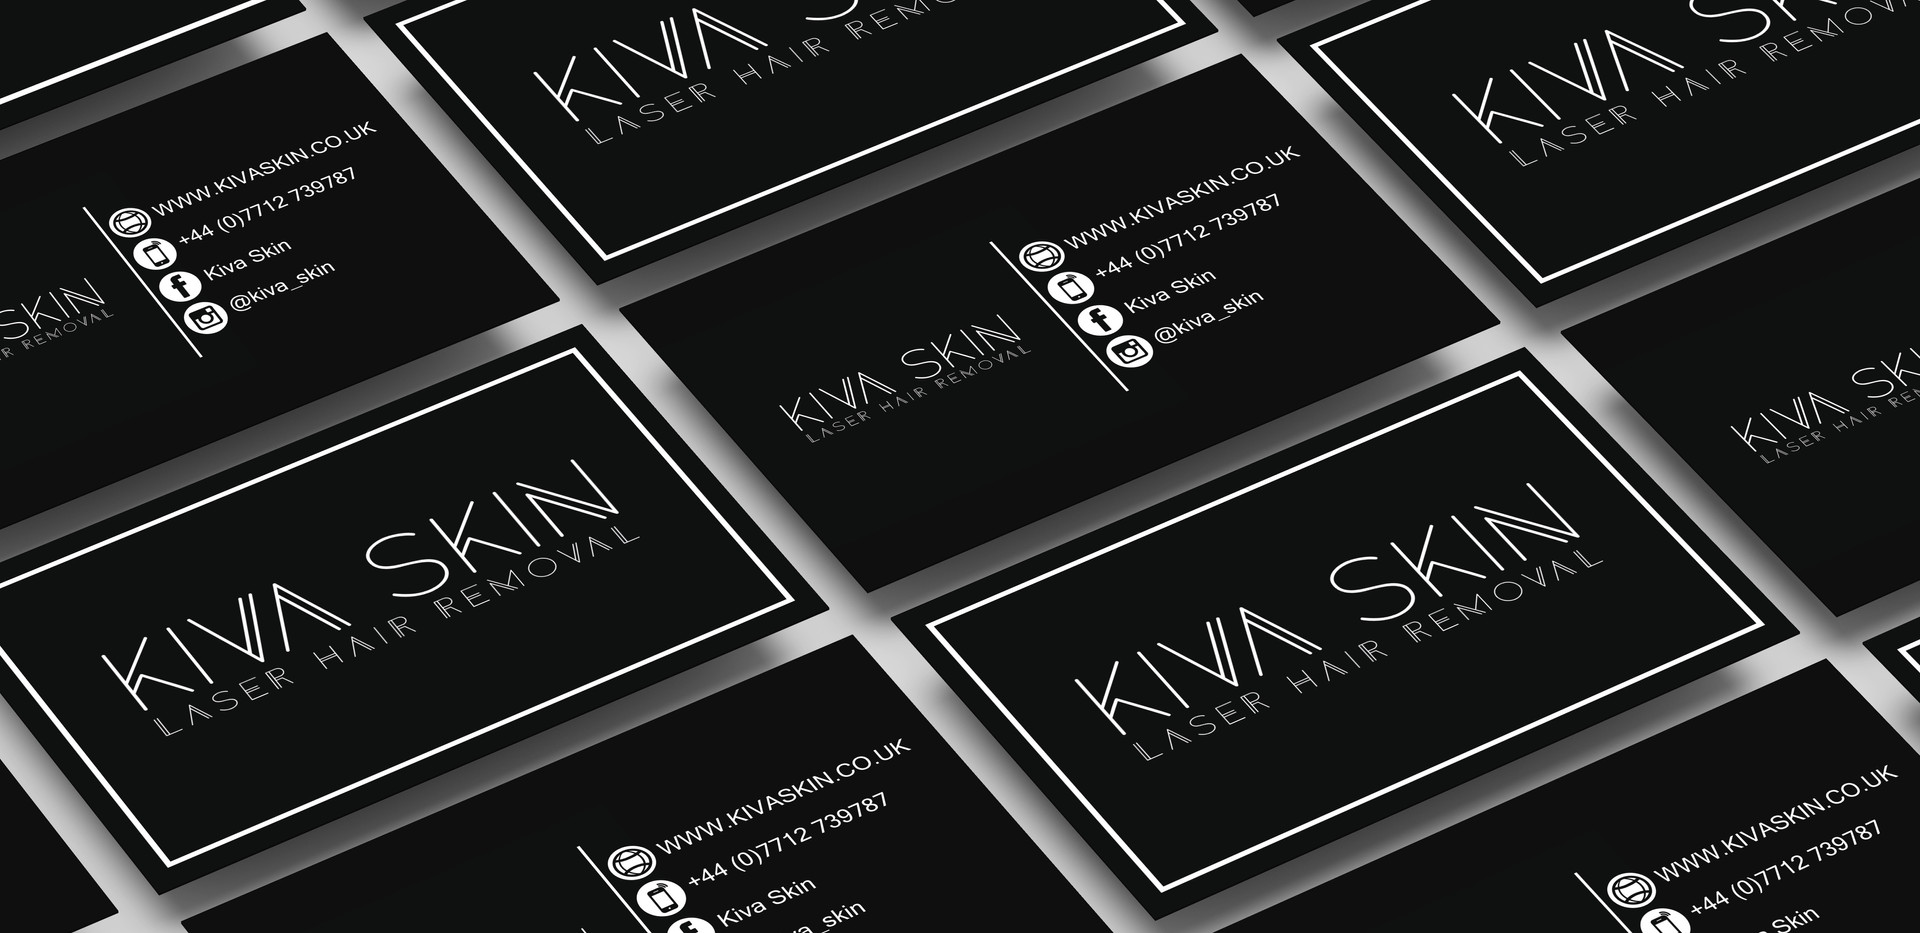 KIVA SKIN Business Card Design